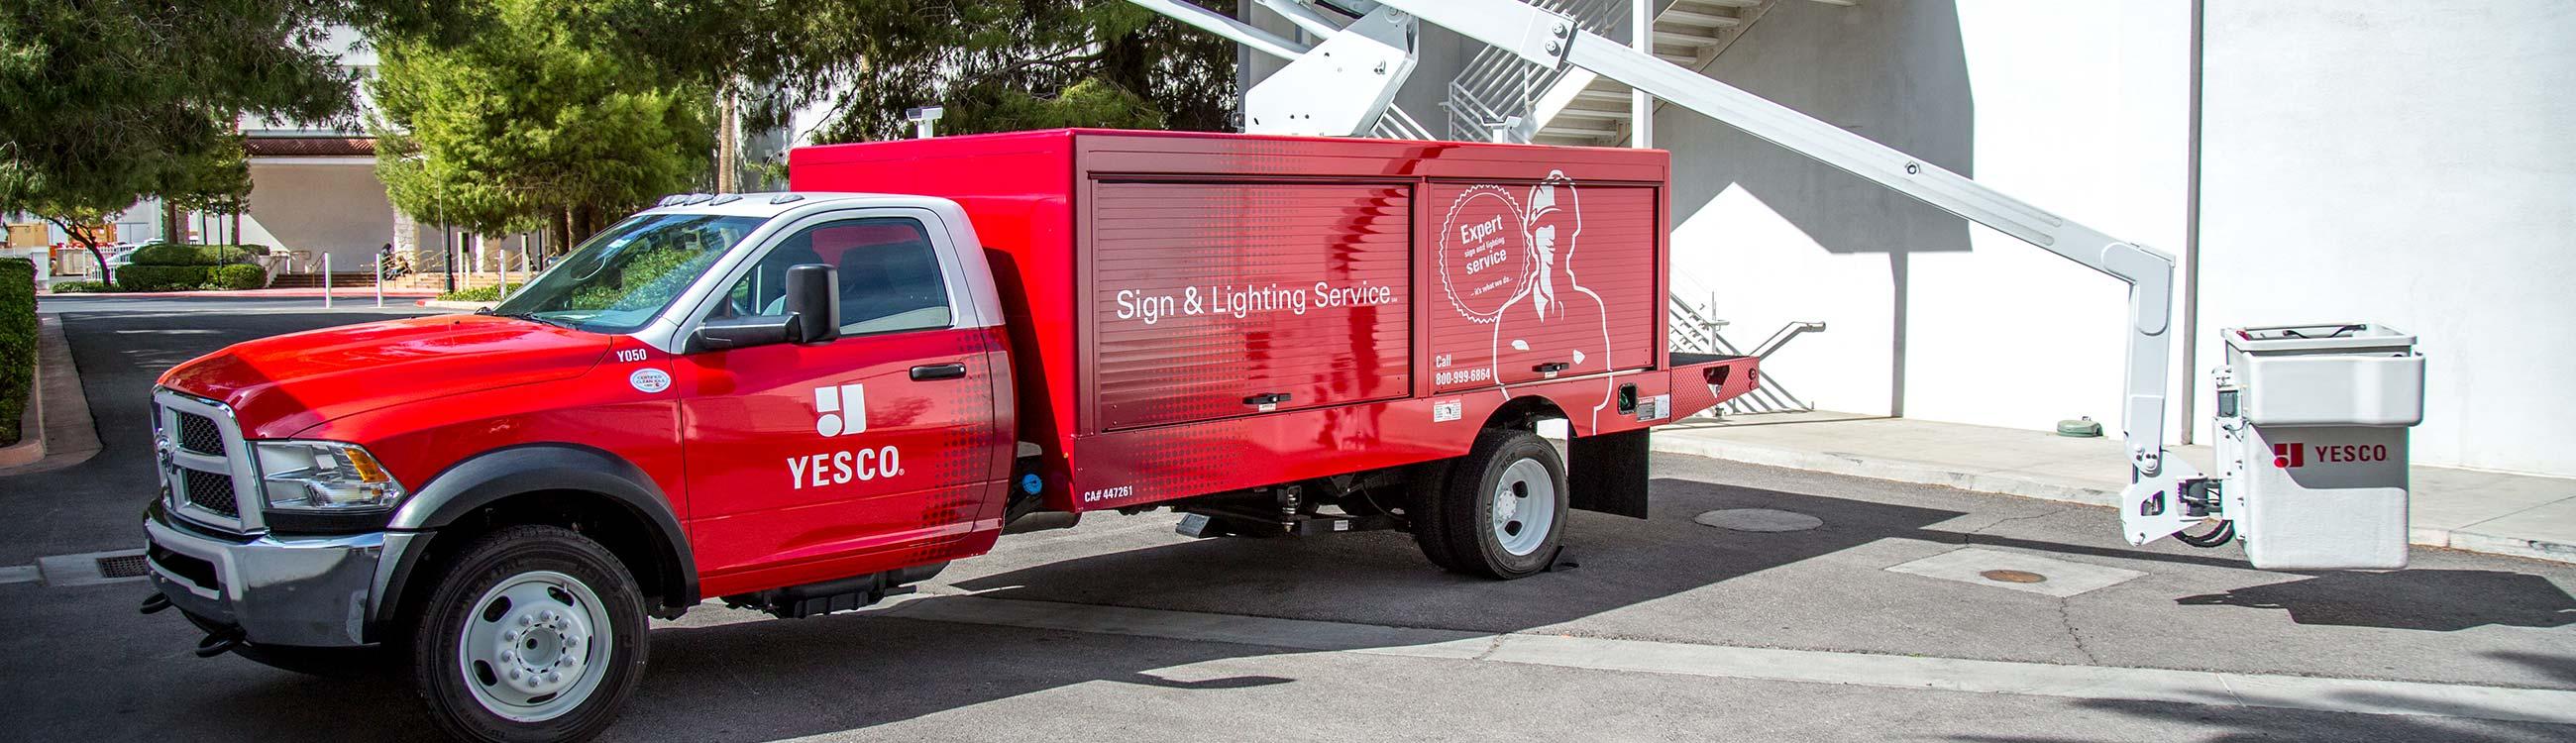 sign&lighting-service Peoria